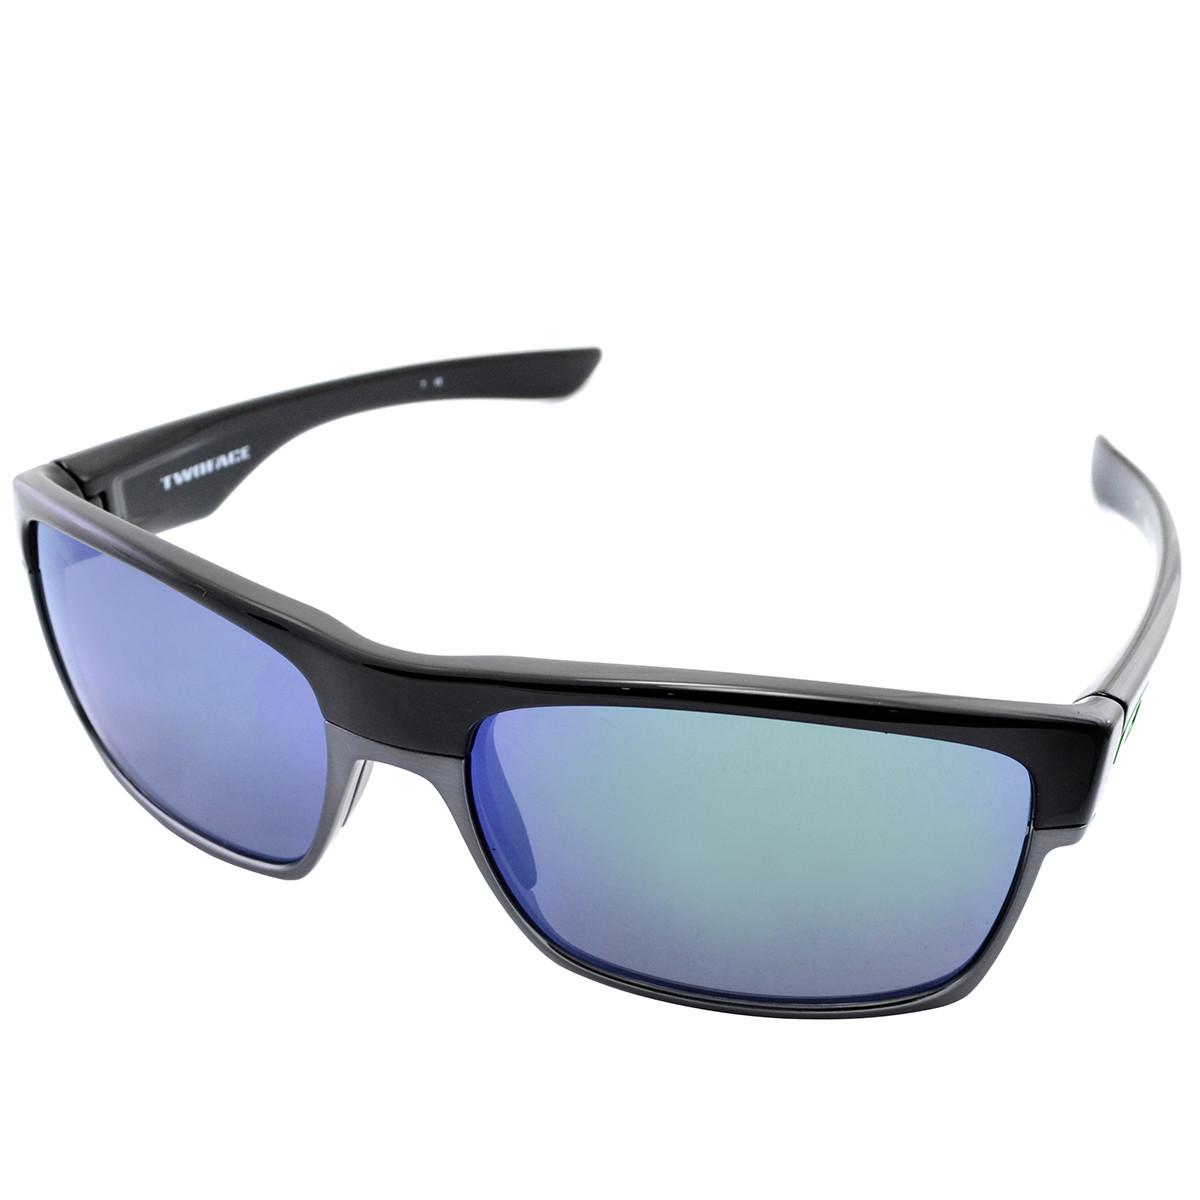 Óculos Oakley TwoFace Polished Black Lente Jade Iridium ref OO9189-04 4ac948c00d